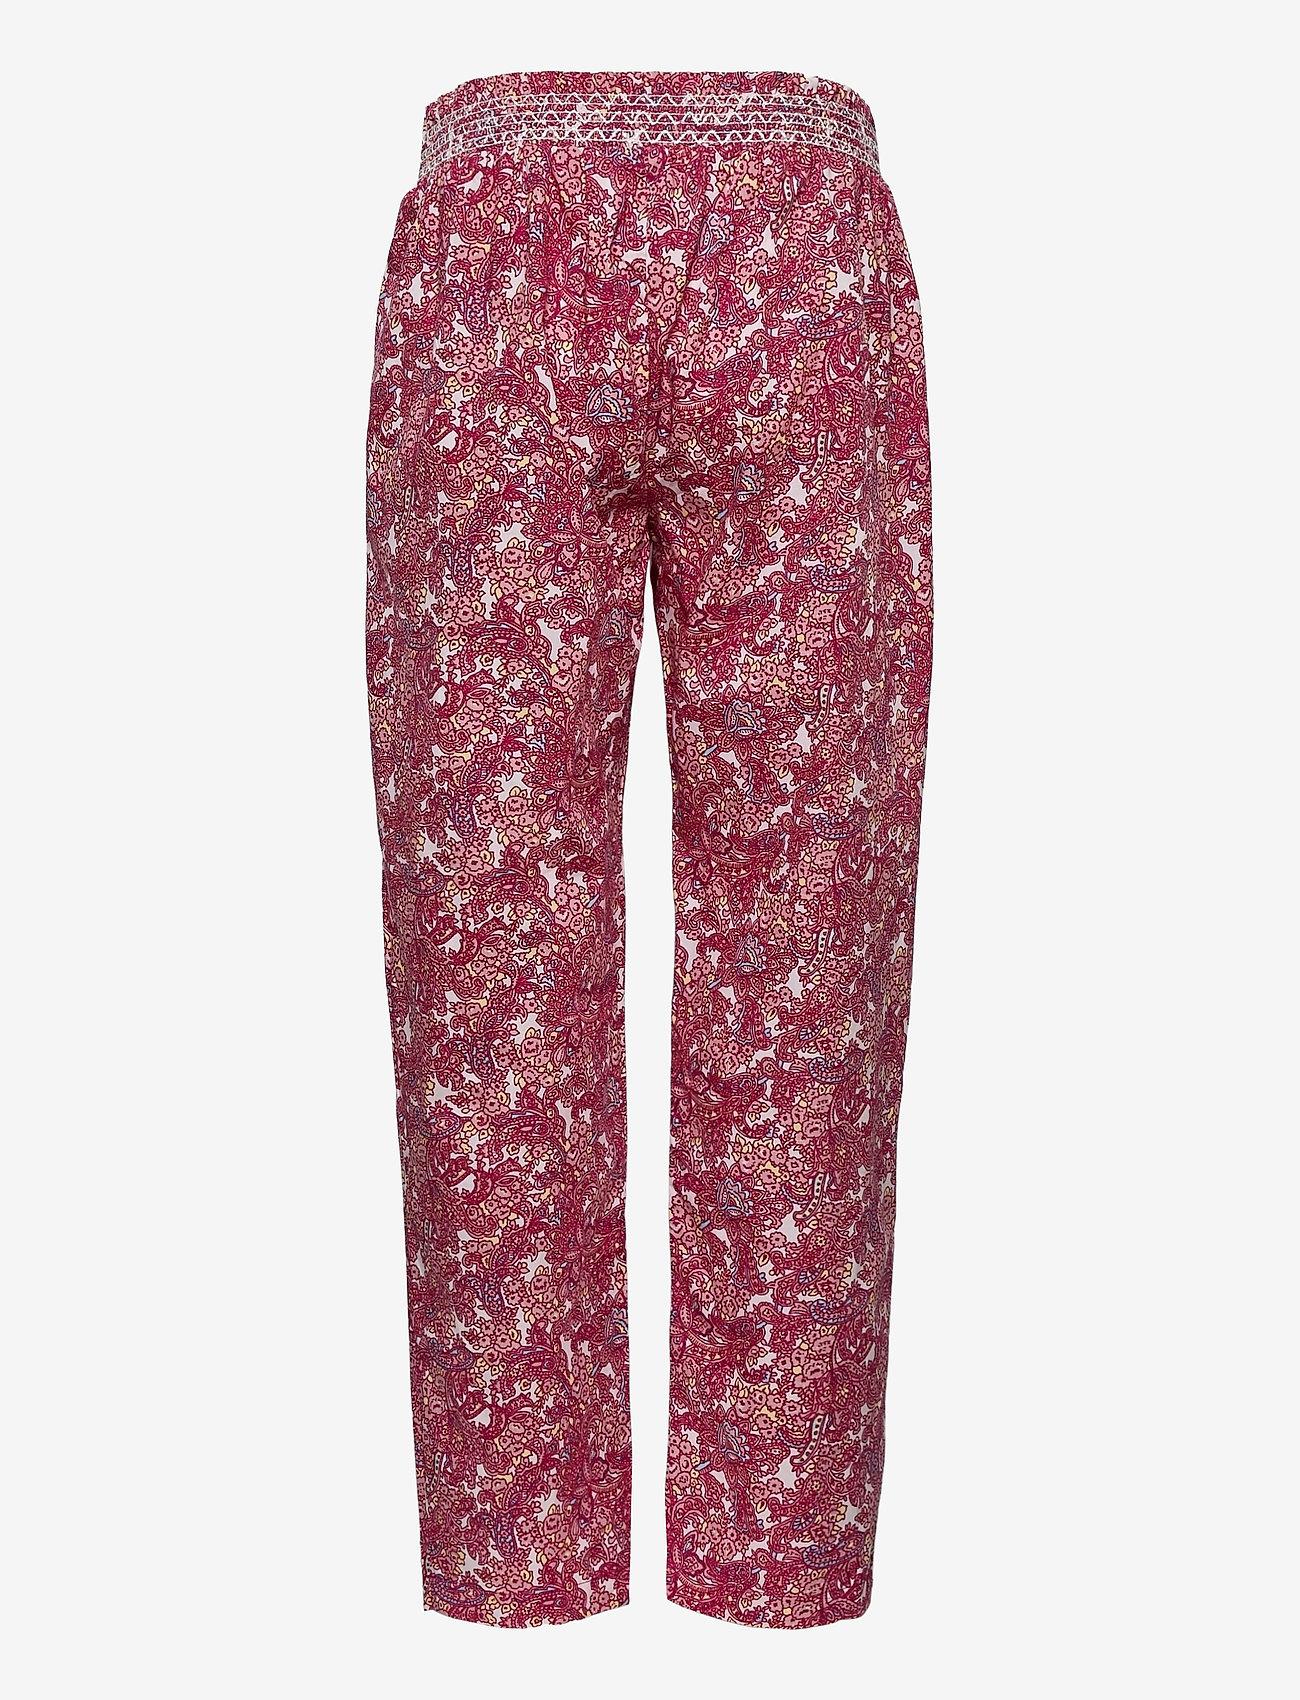 Noa Noa Miniature - Trousers - trousers - print rosa - 1